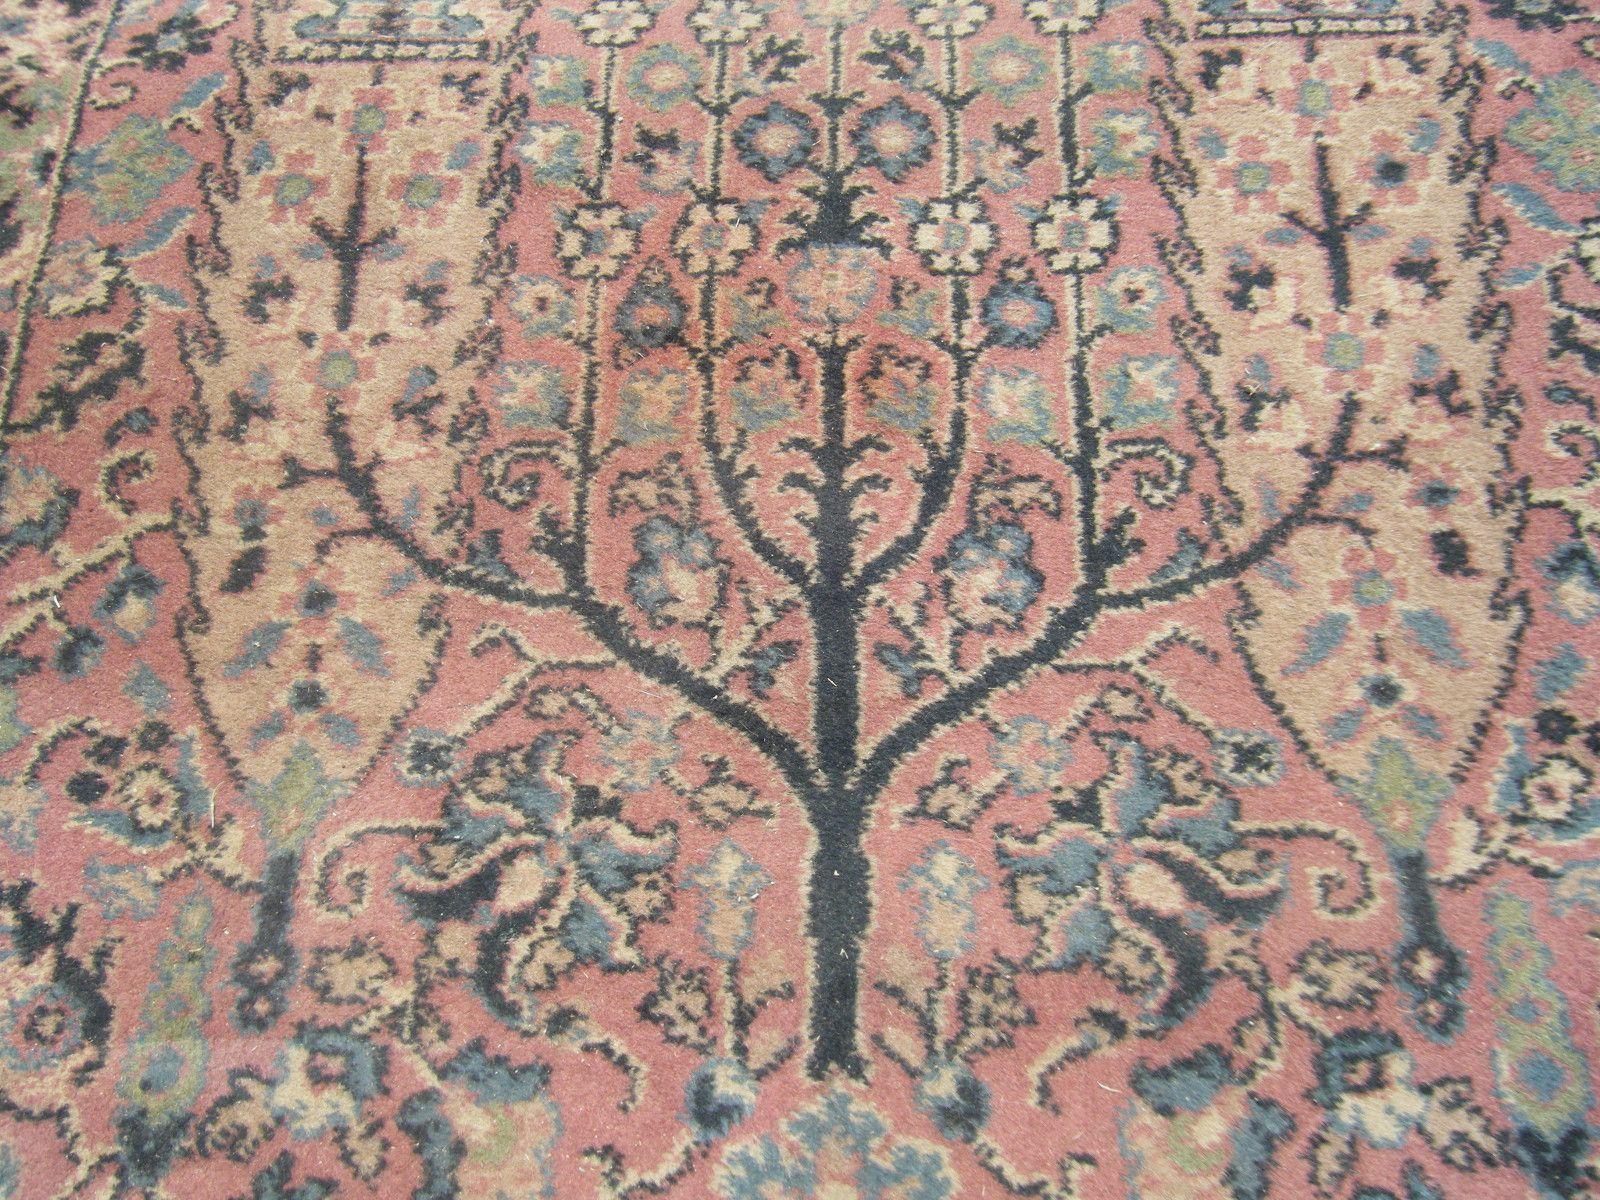 Wilton Rugs Antique Home Decor